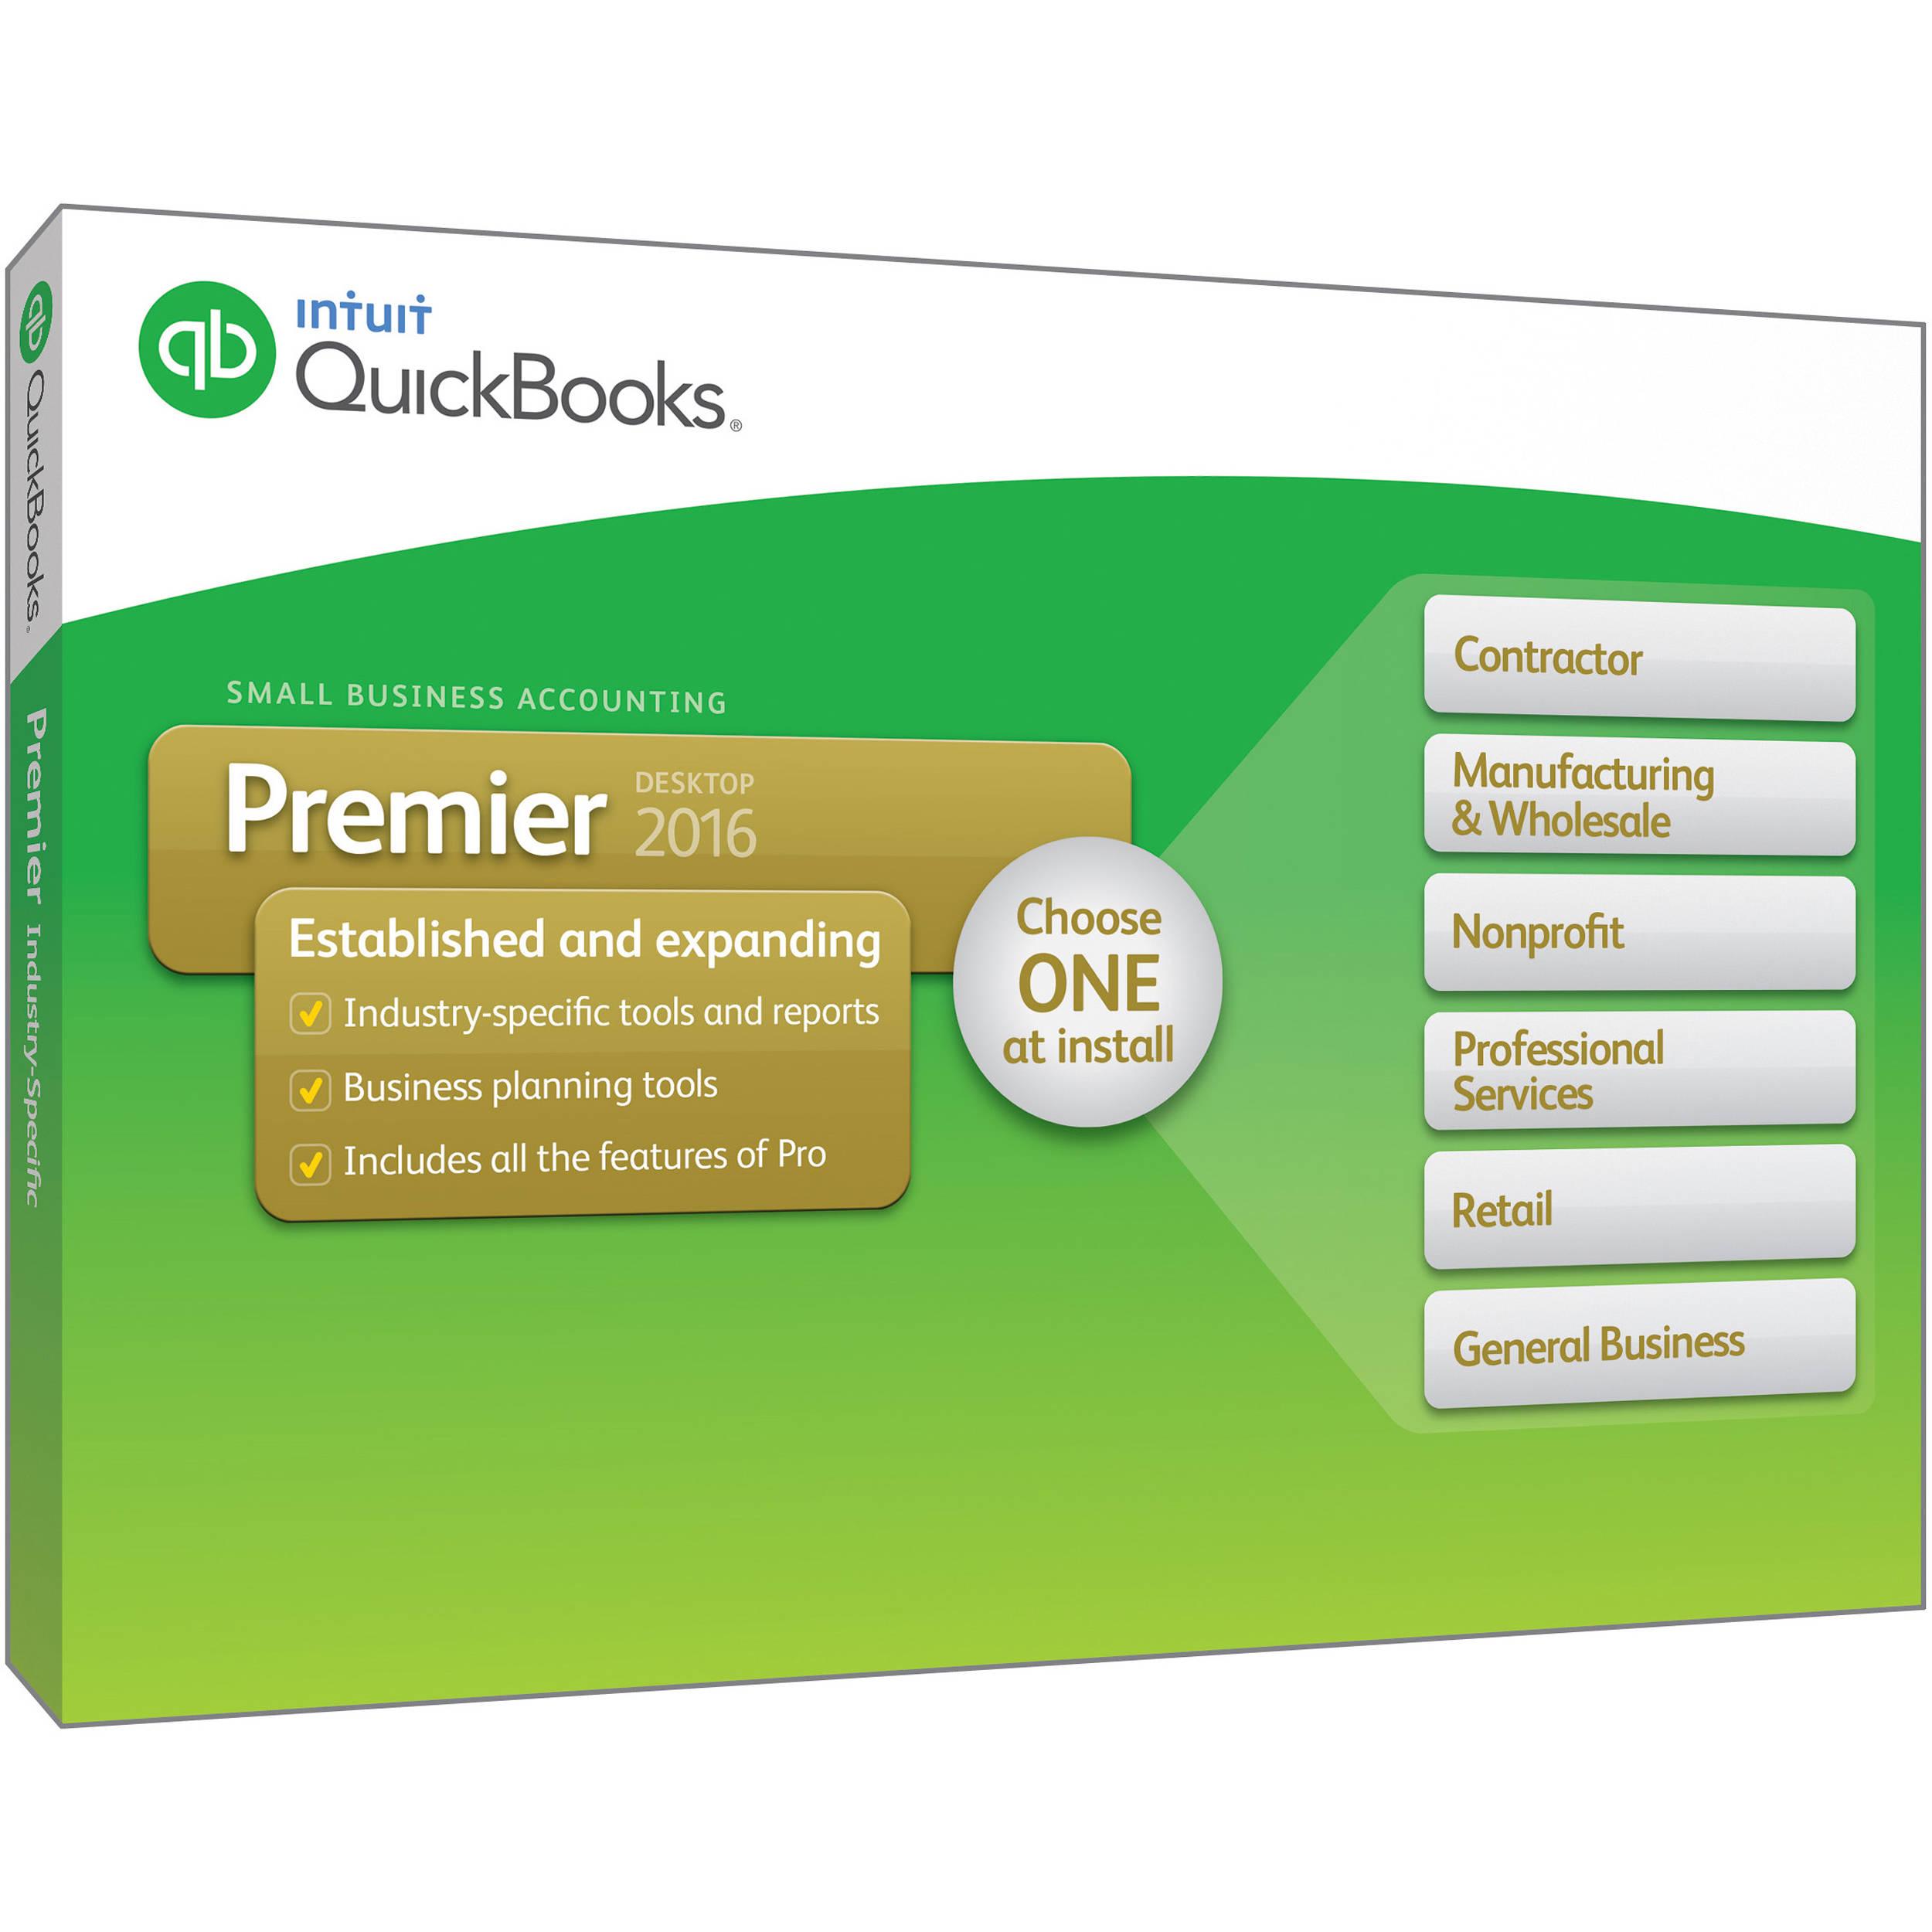 Download free quickbooks key, quickbooks key 8. 5 download.